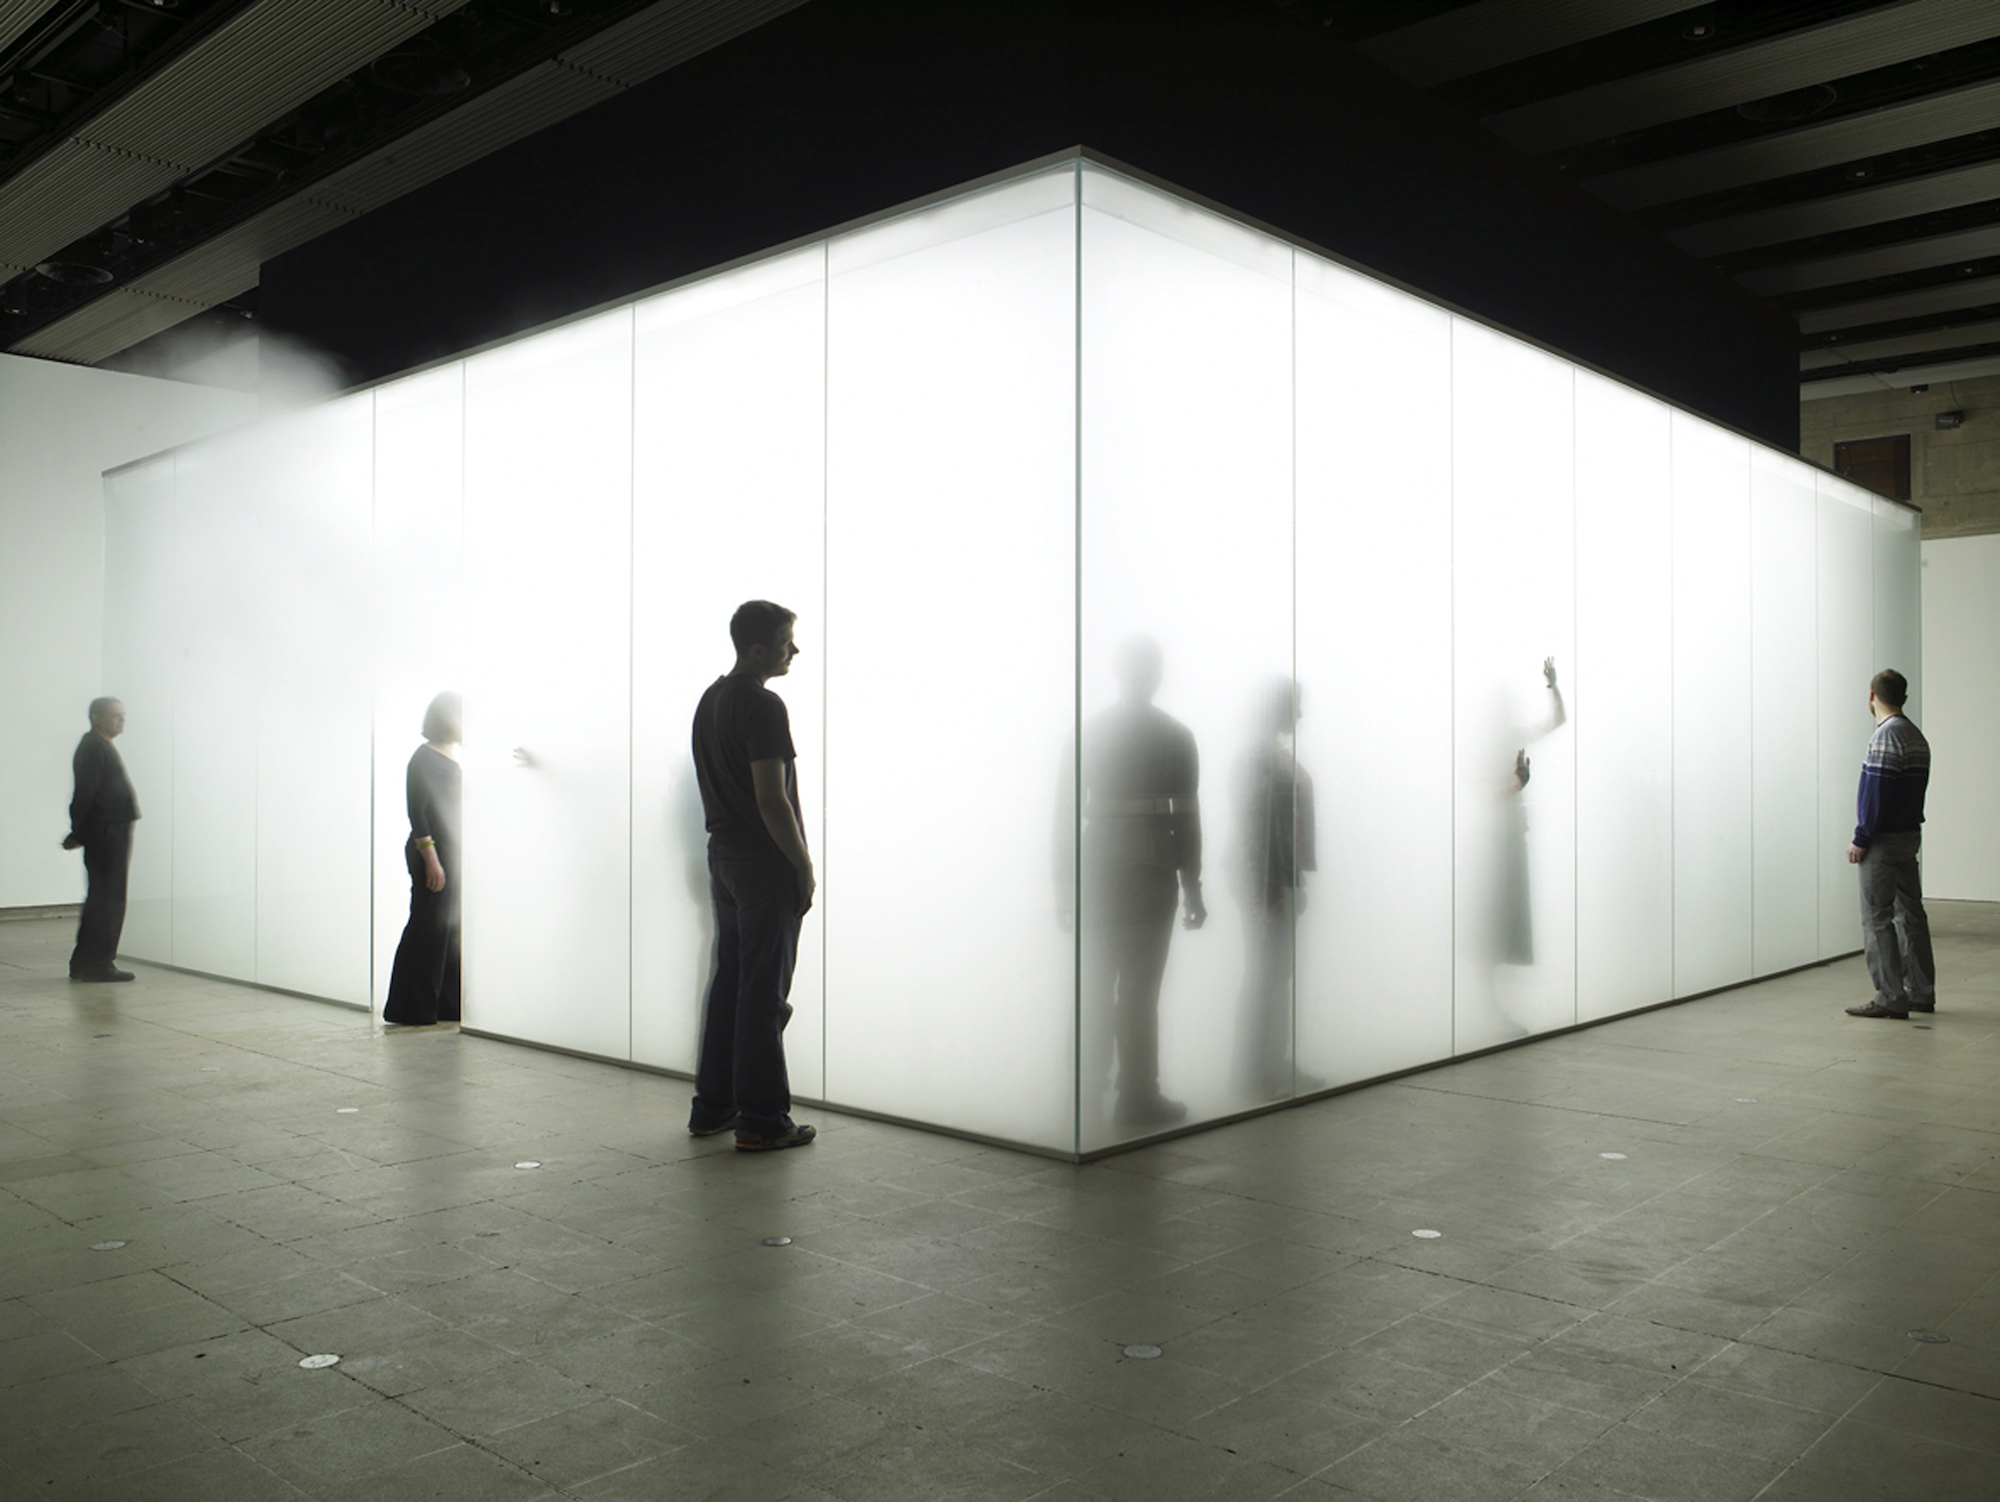 Antony Gormley, Blind Light, 2007